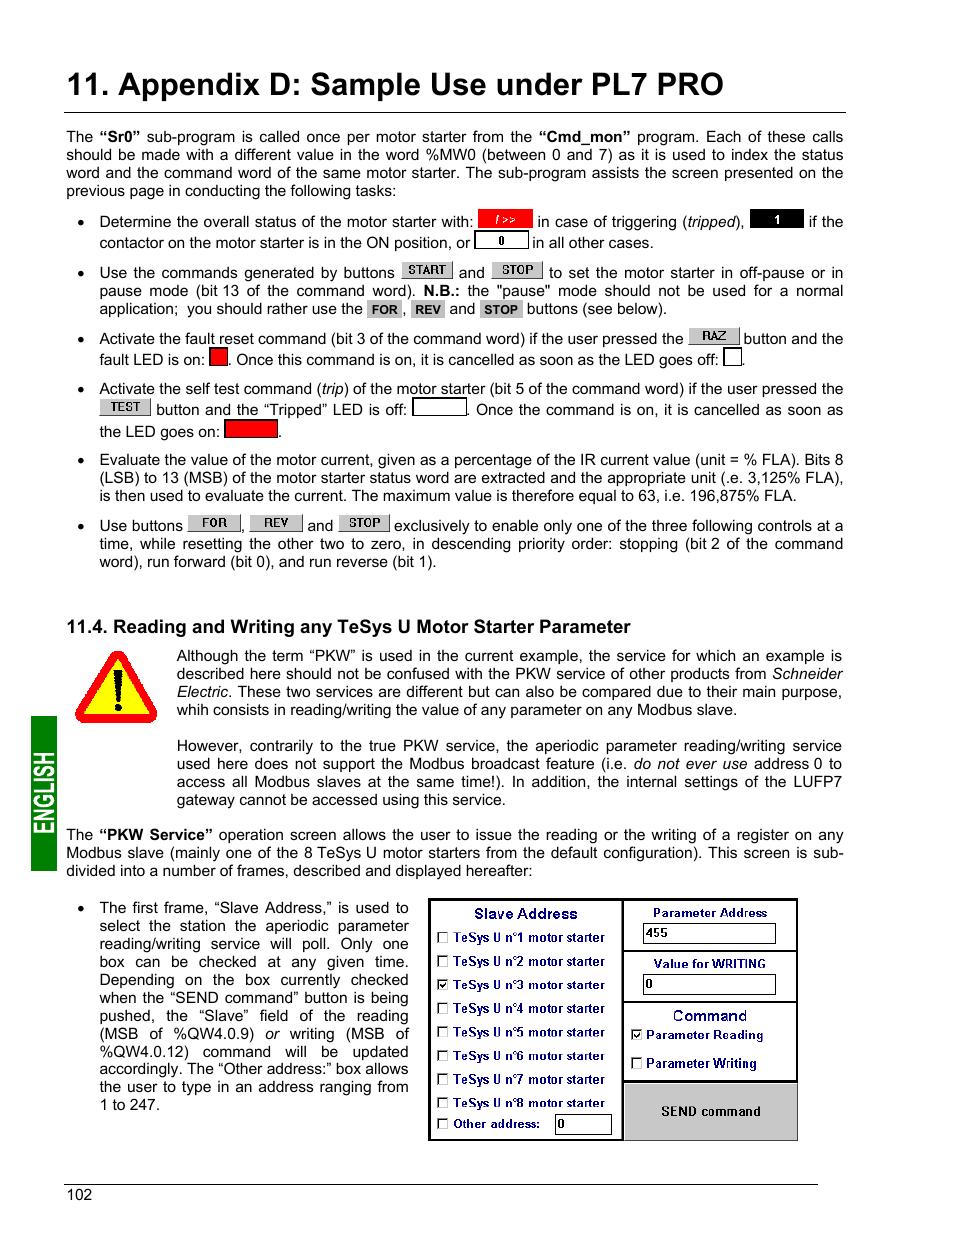 appendix d sample use under pl7 pro schneider electric gateway rh manualsdir com Gateway Laptop Manual User Manual PDF